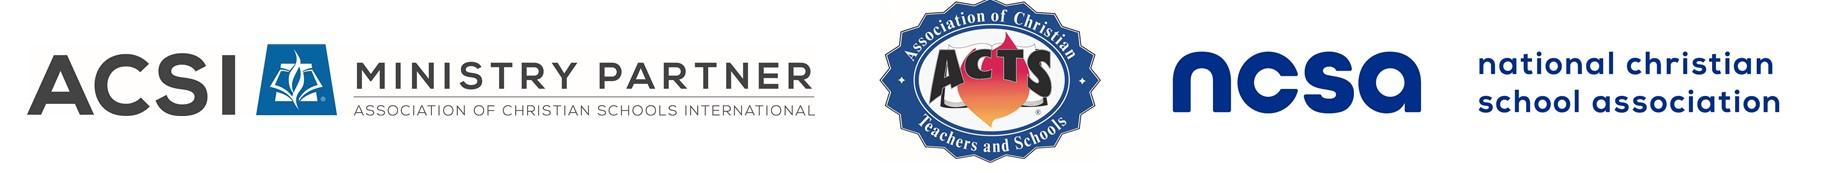 ACSI and NCSA Logos-Mar-03-2021-04-06-13-53-PM